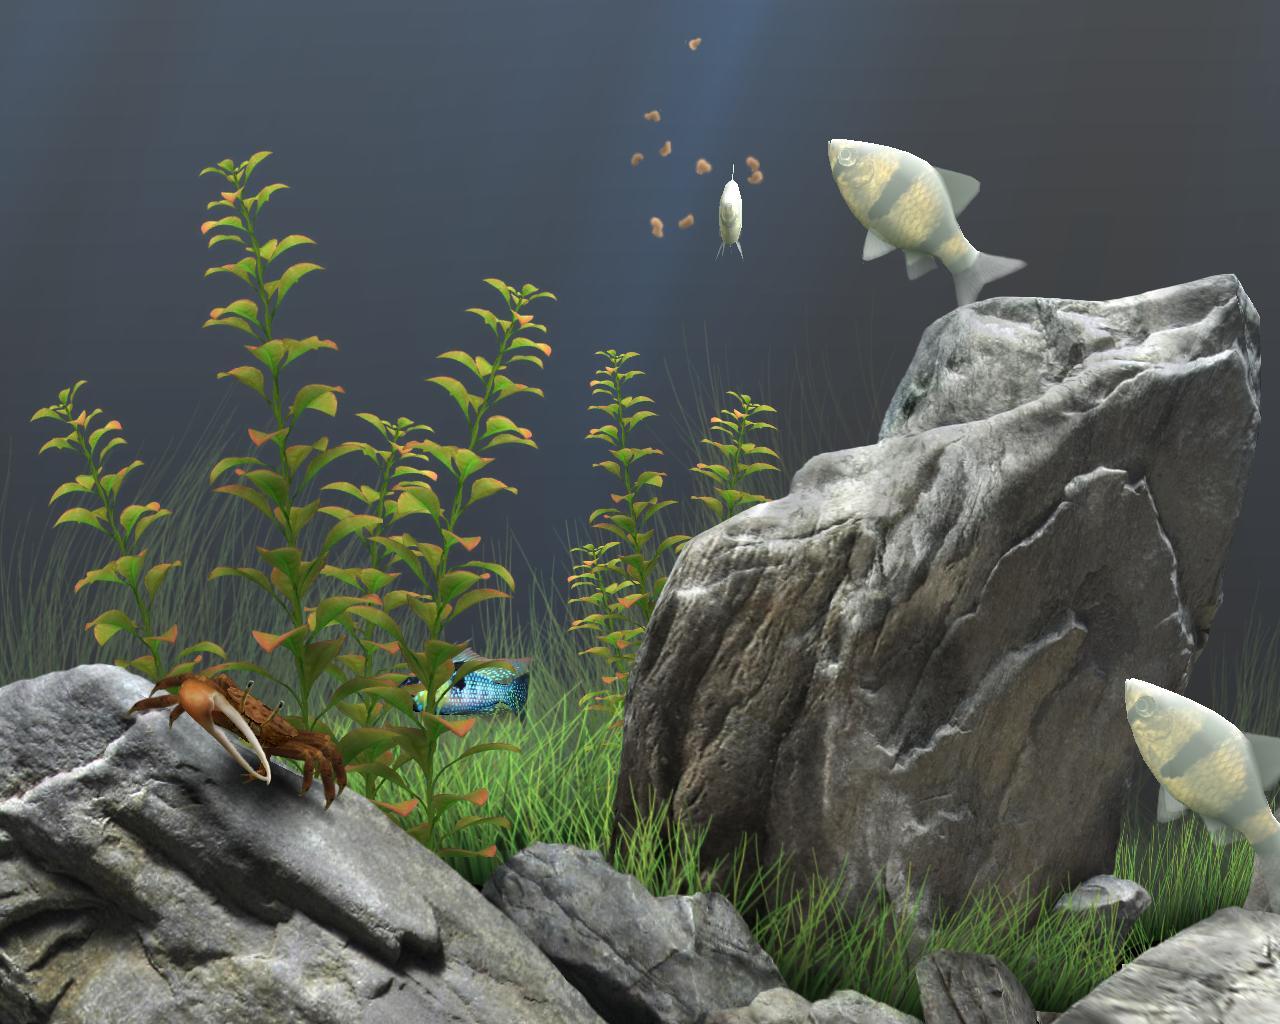 Dream aquarium screensaver v final rus - Dream aquarium virtual fishtank 1 ...